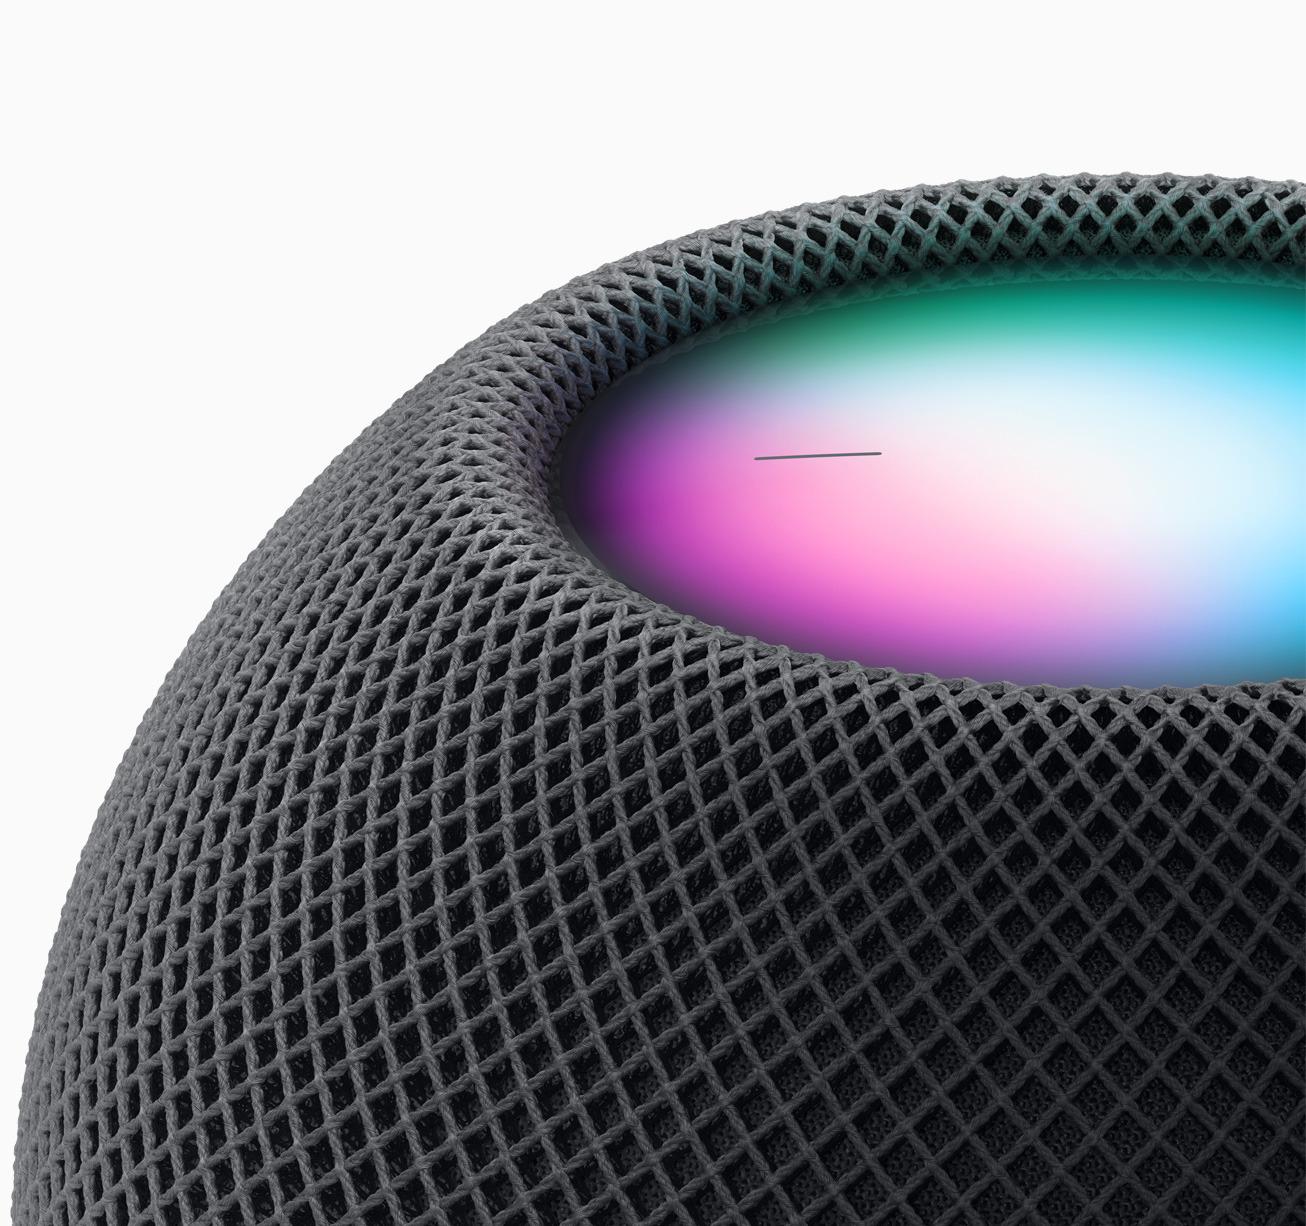 Press and hold on the top of HomePod mini to invoke Siri